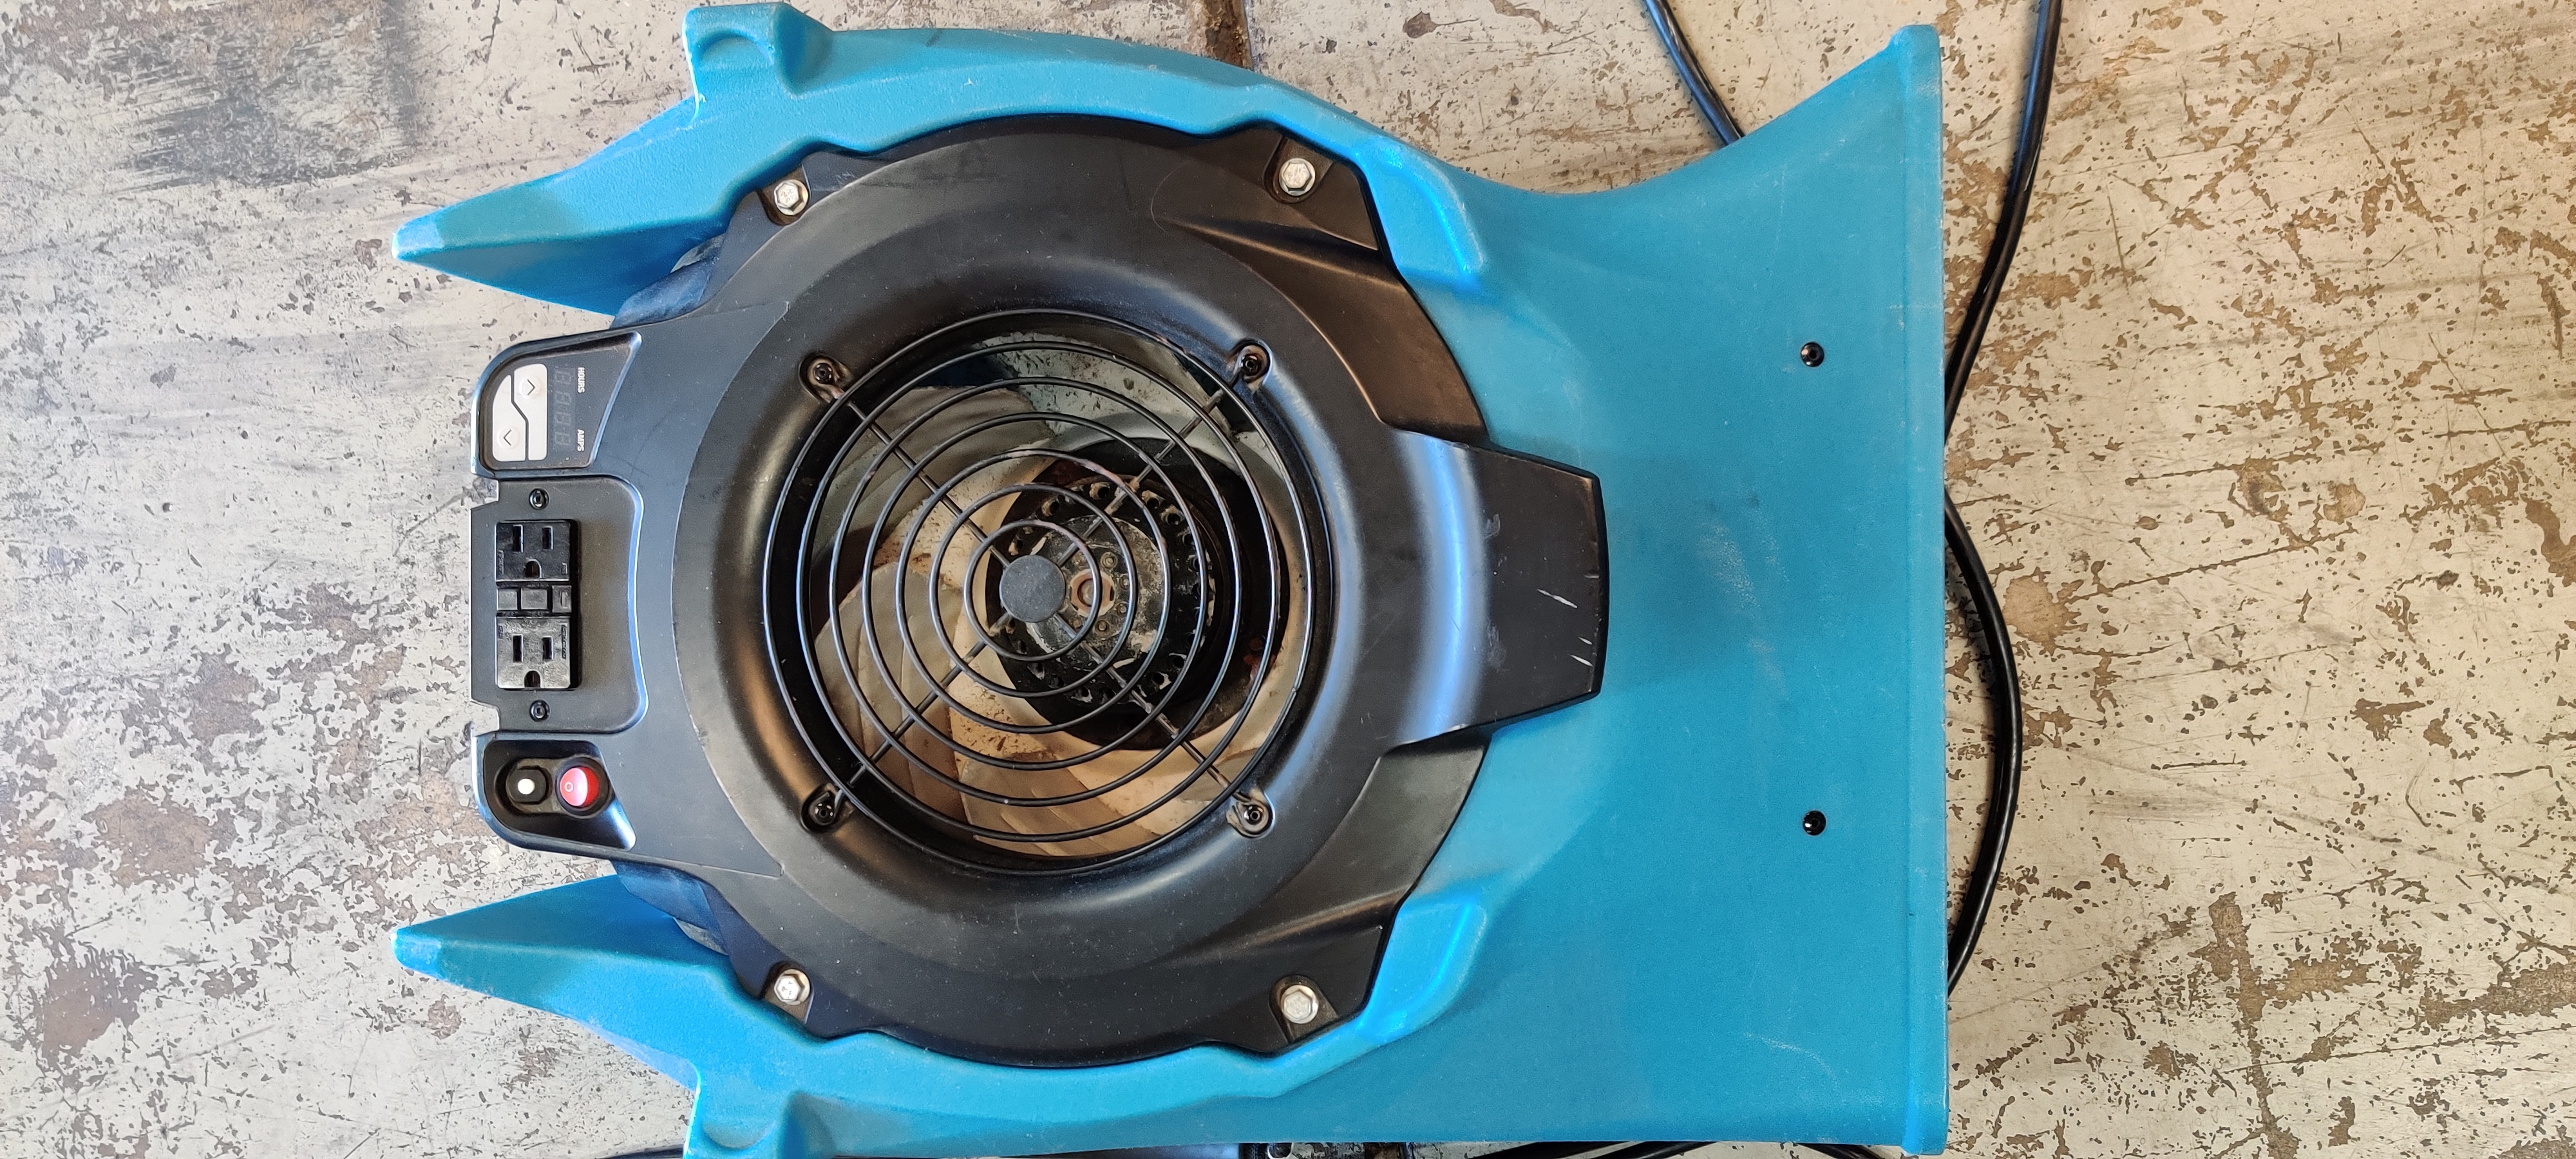 blueairmover1